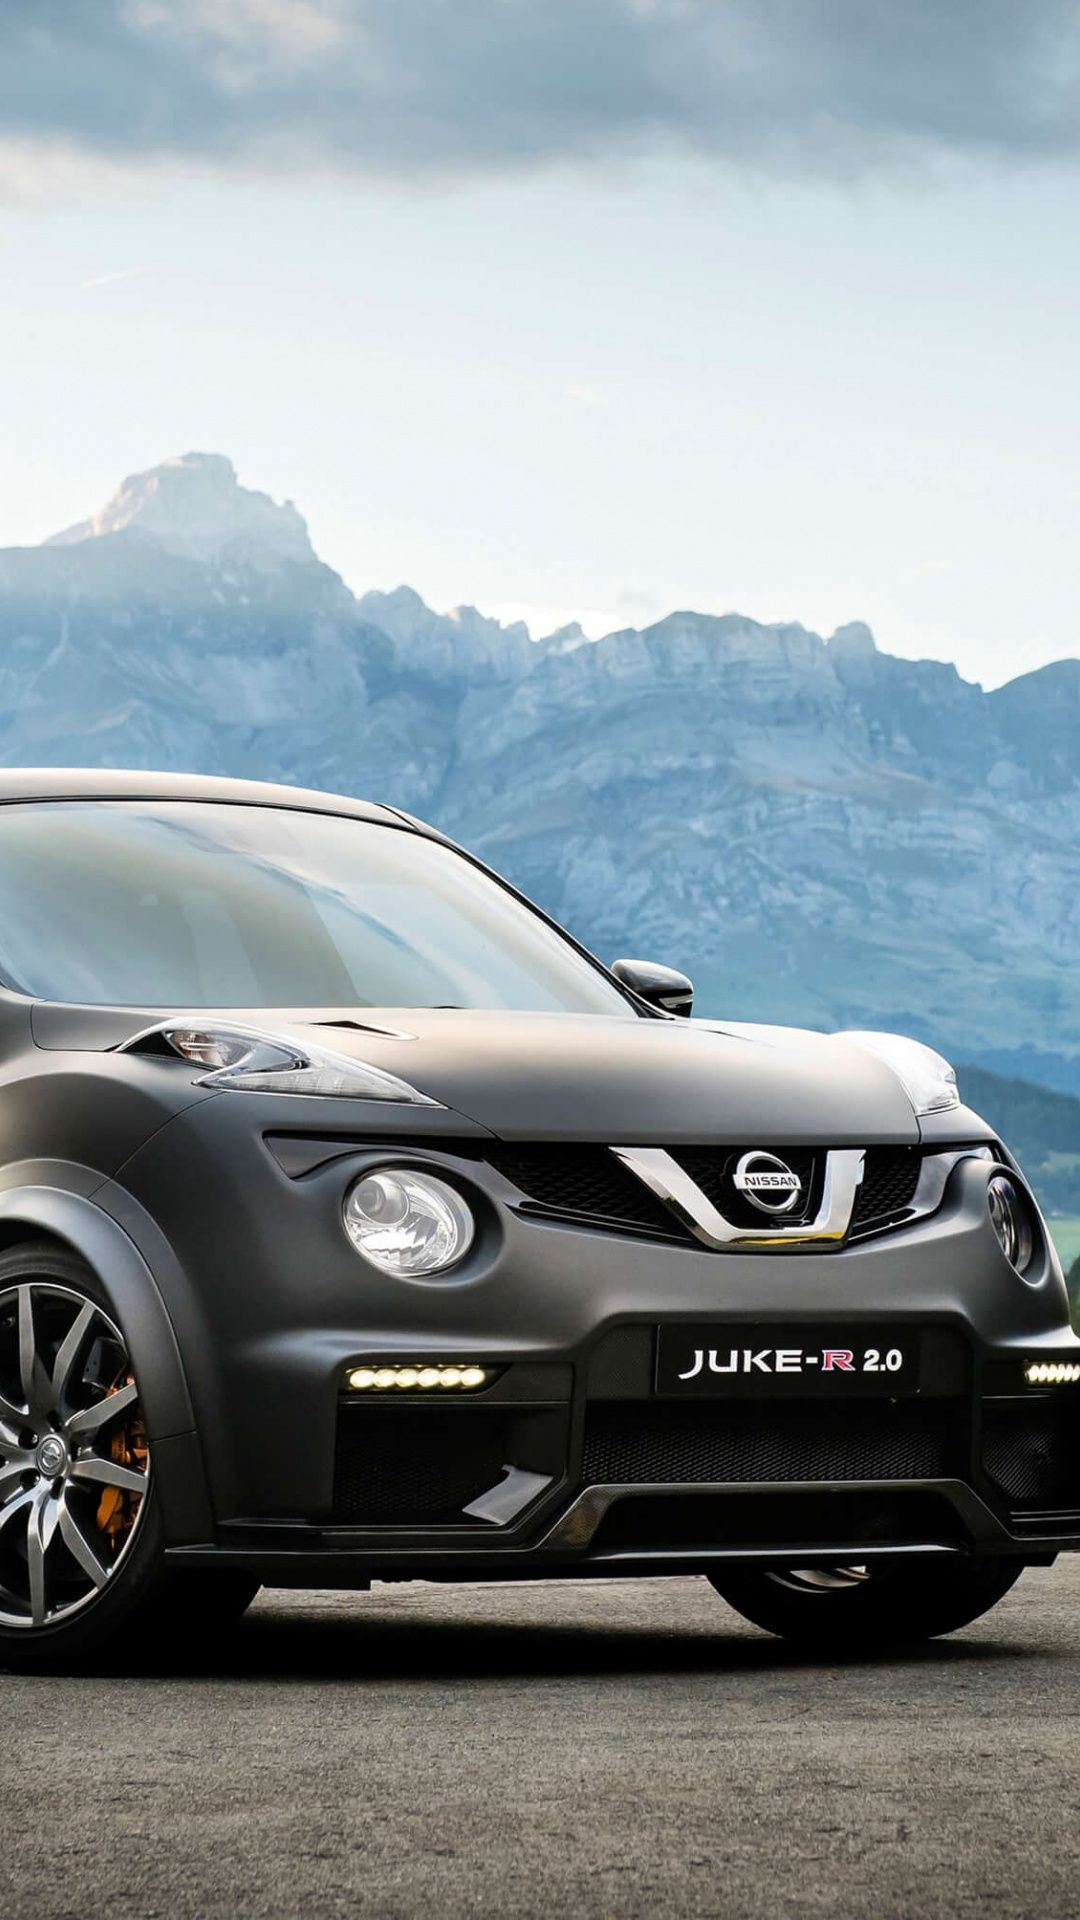 Nissan Juke Black Compact Car Wallpaper Nissan Compact Cars